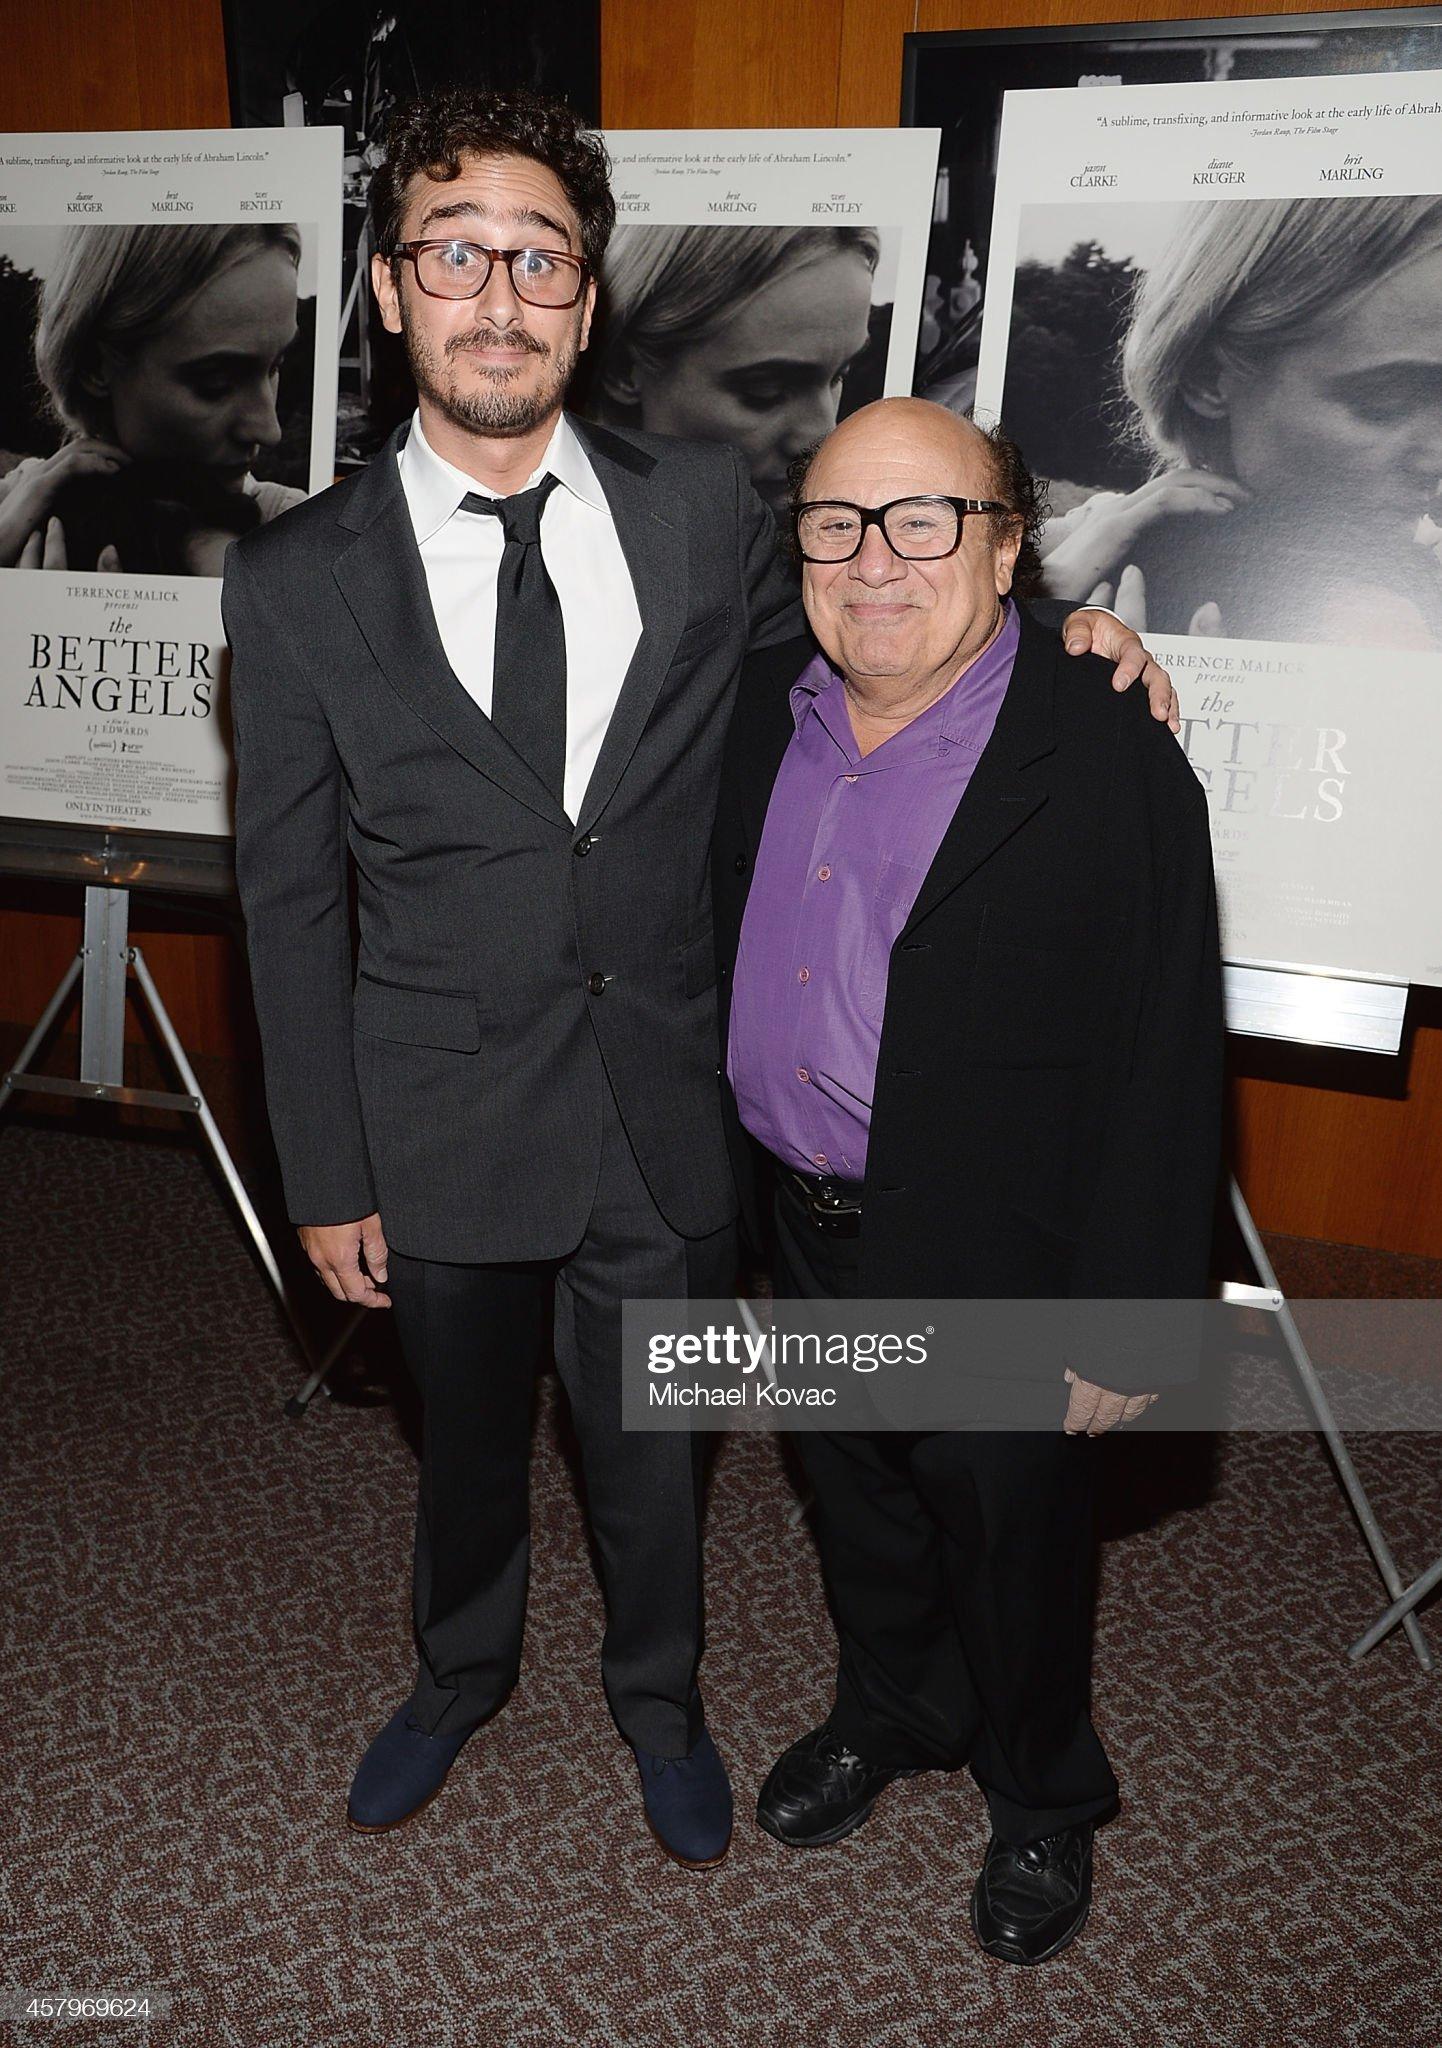 ¿Cuánto mide Danny Devito? - Altura - Real height - Página 2 Producer-jake-devito-and-actor-danny-devito-attend-the-los-angeles-picture-id457969624?s=2048x2048